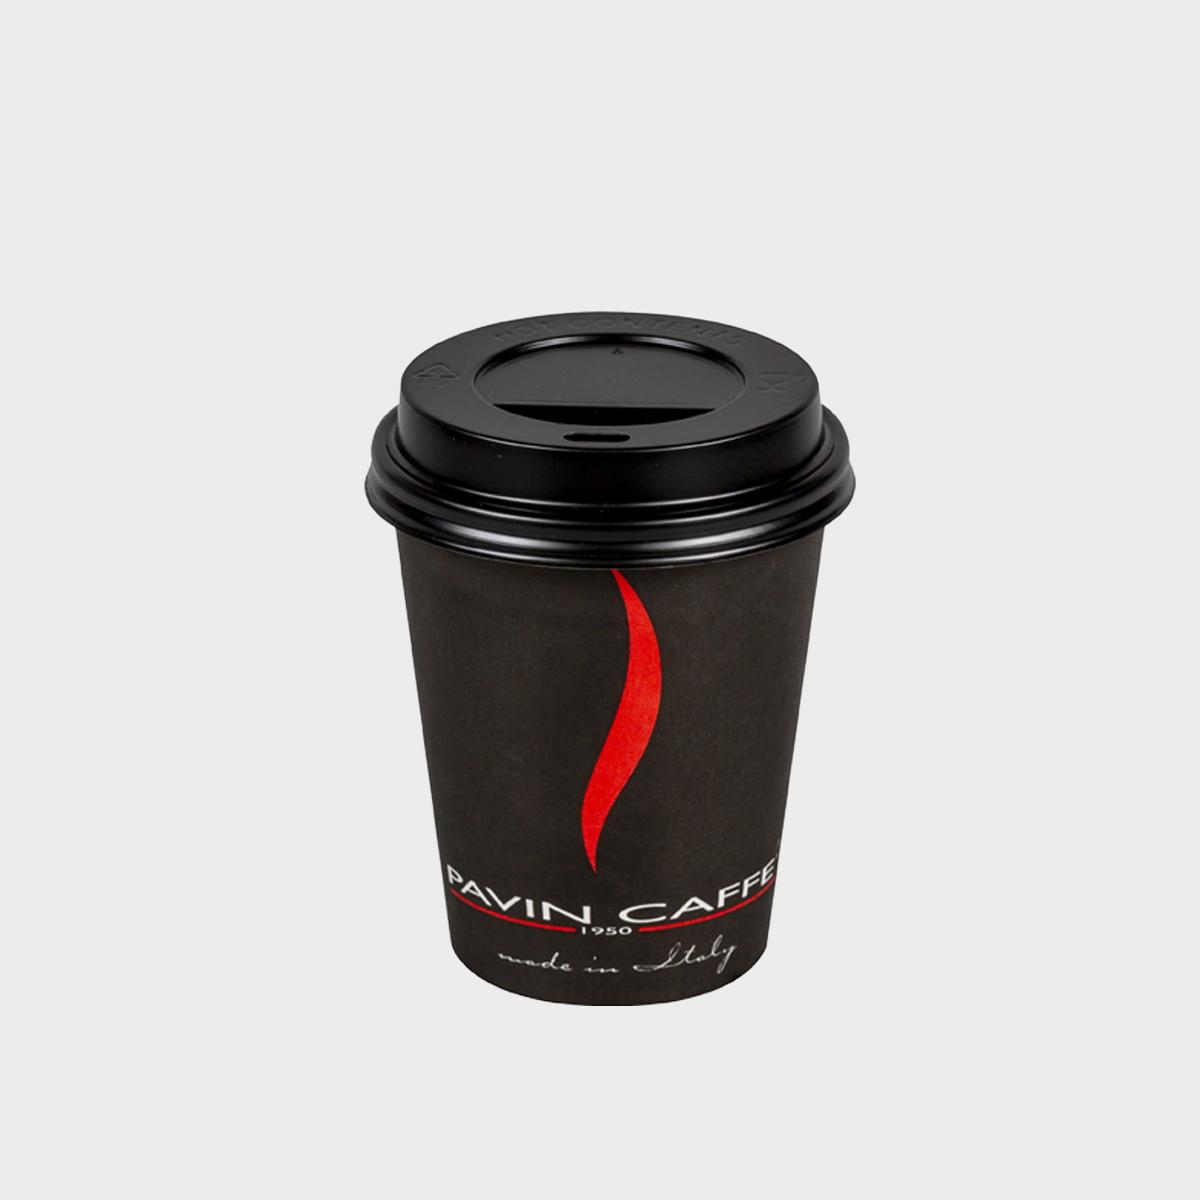 bicchiere-takeaway-caffe-pavin-16-oz